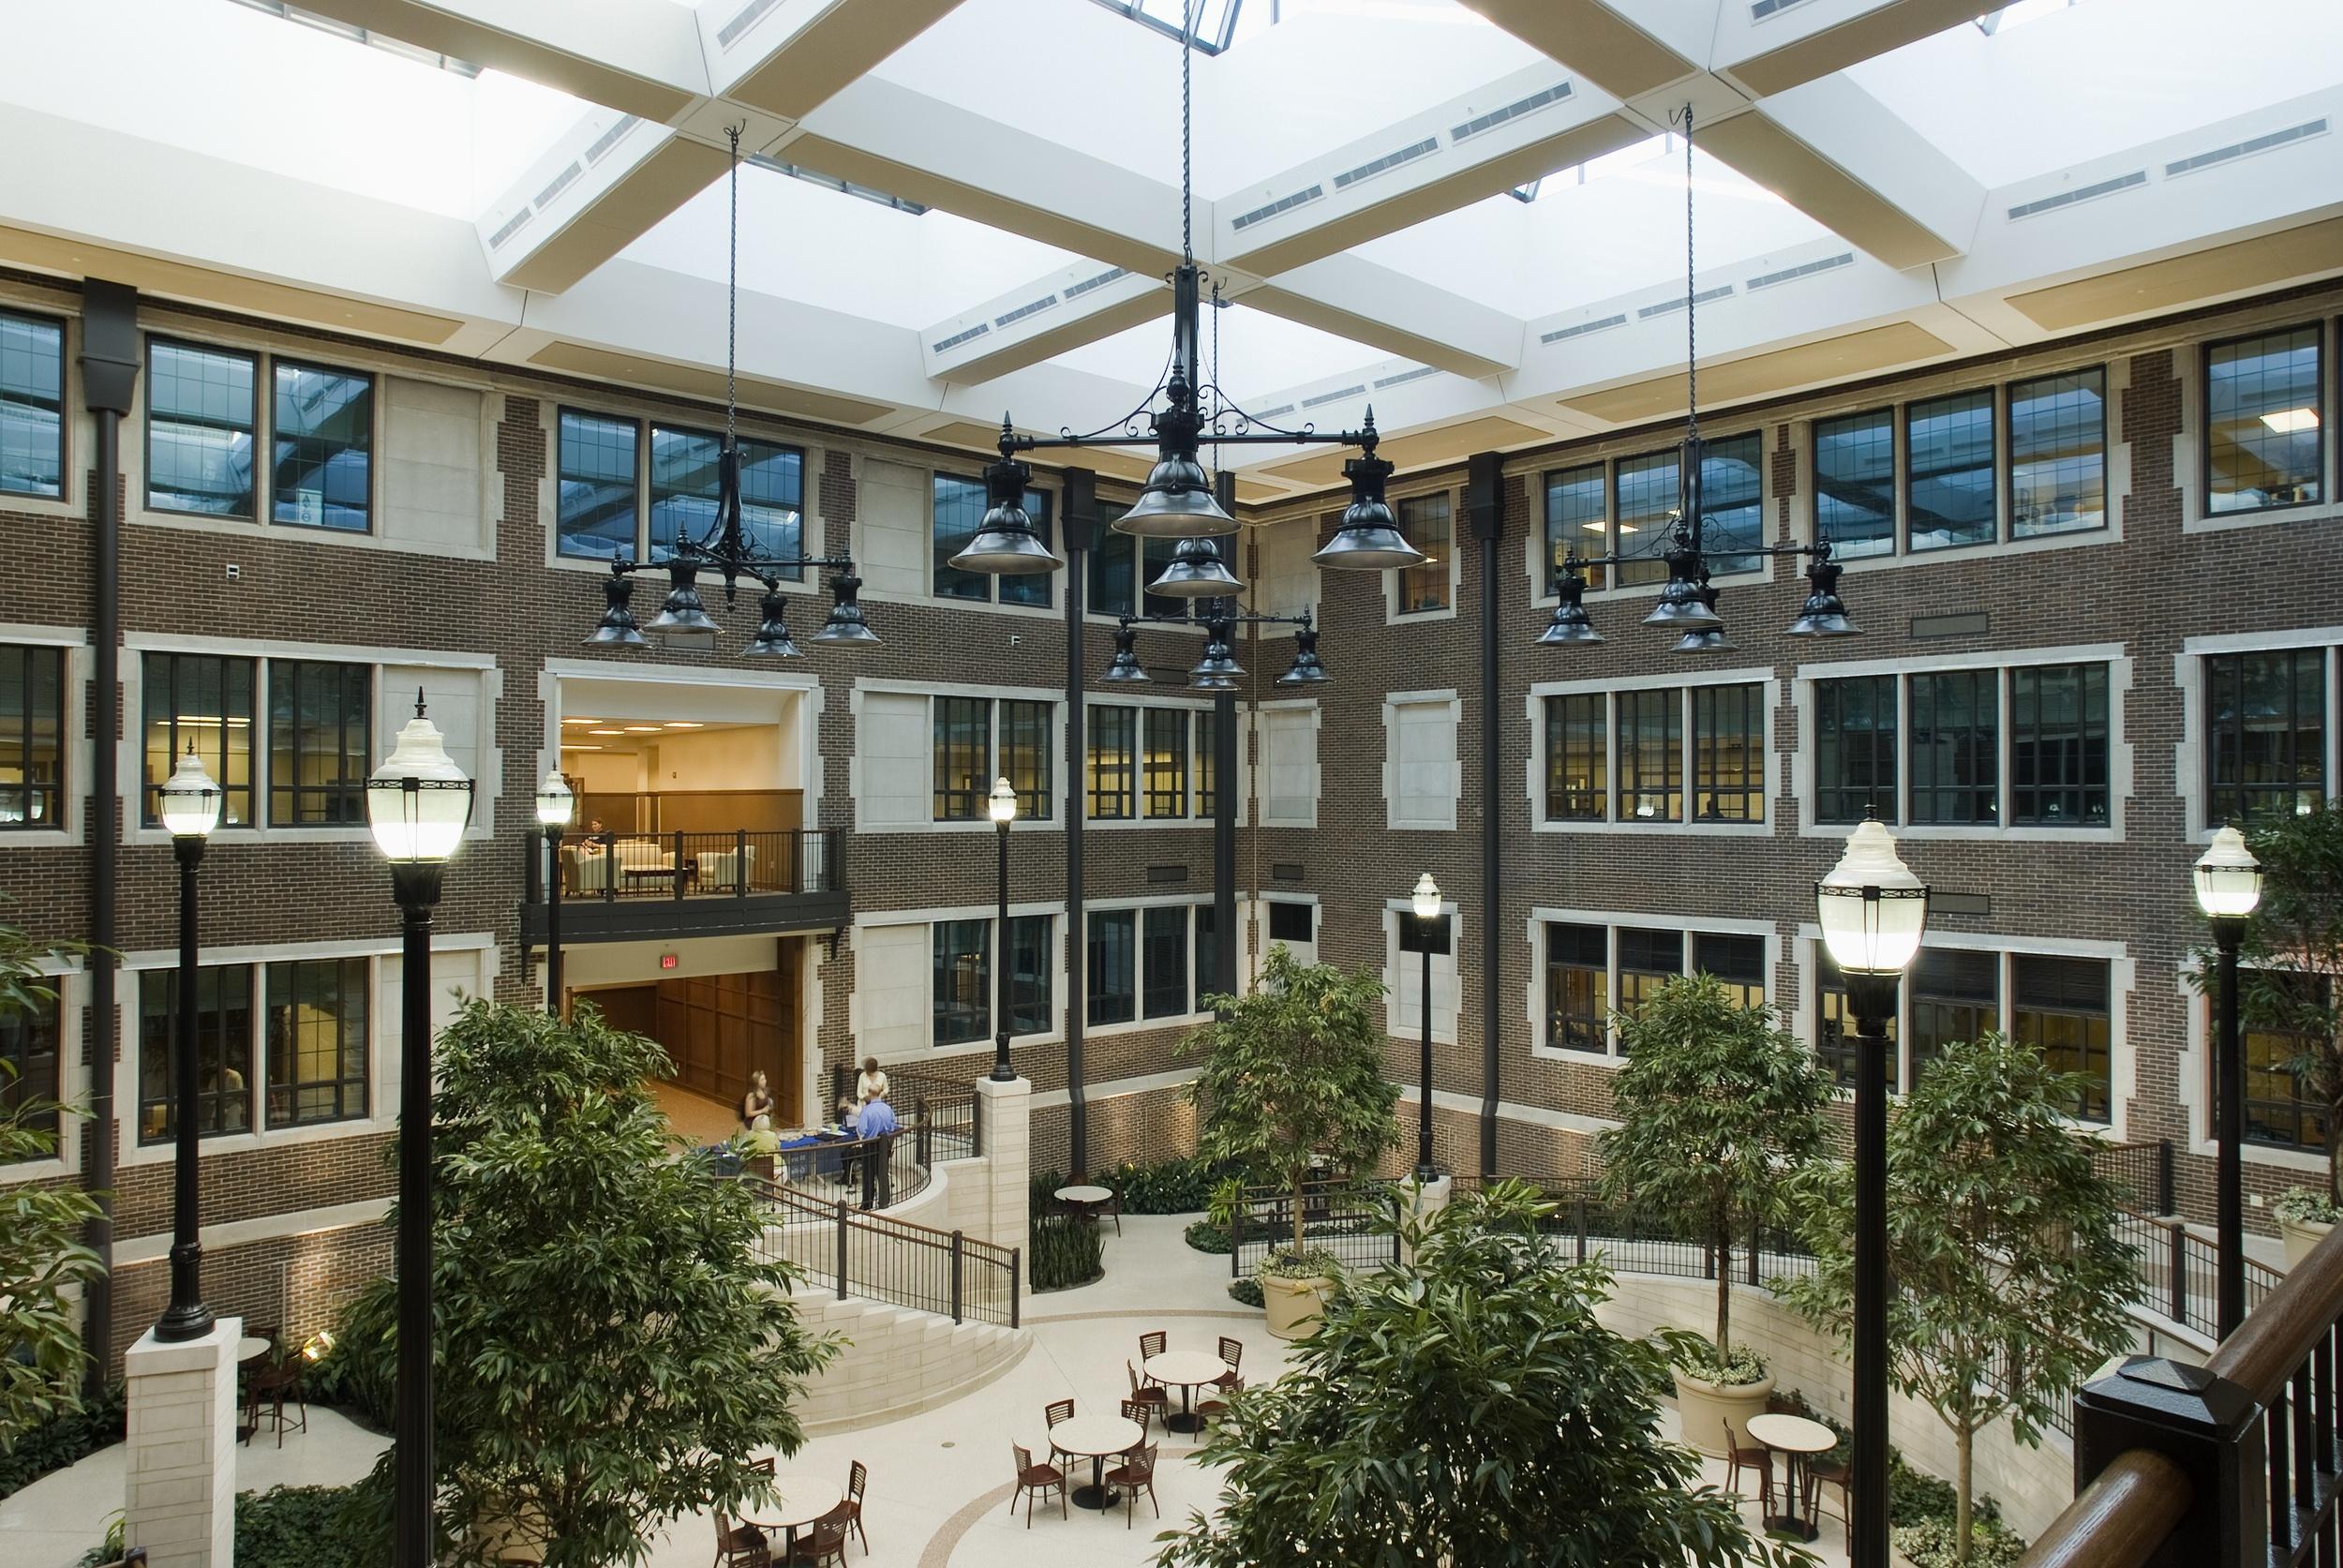 Indiana State University College of Education Atrium